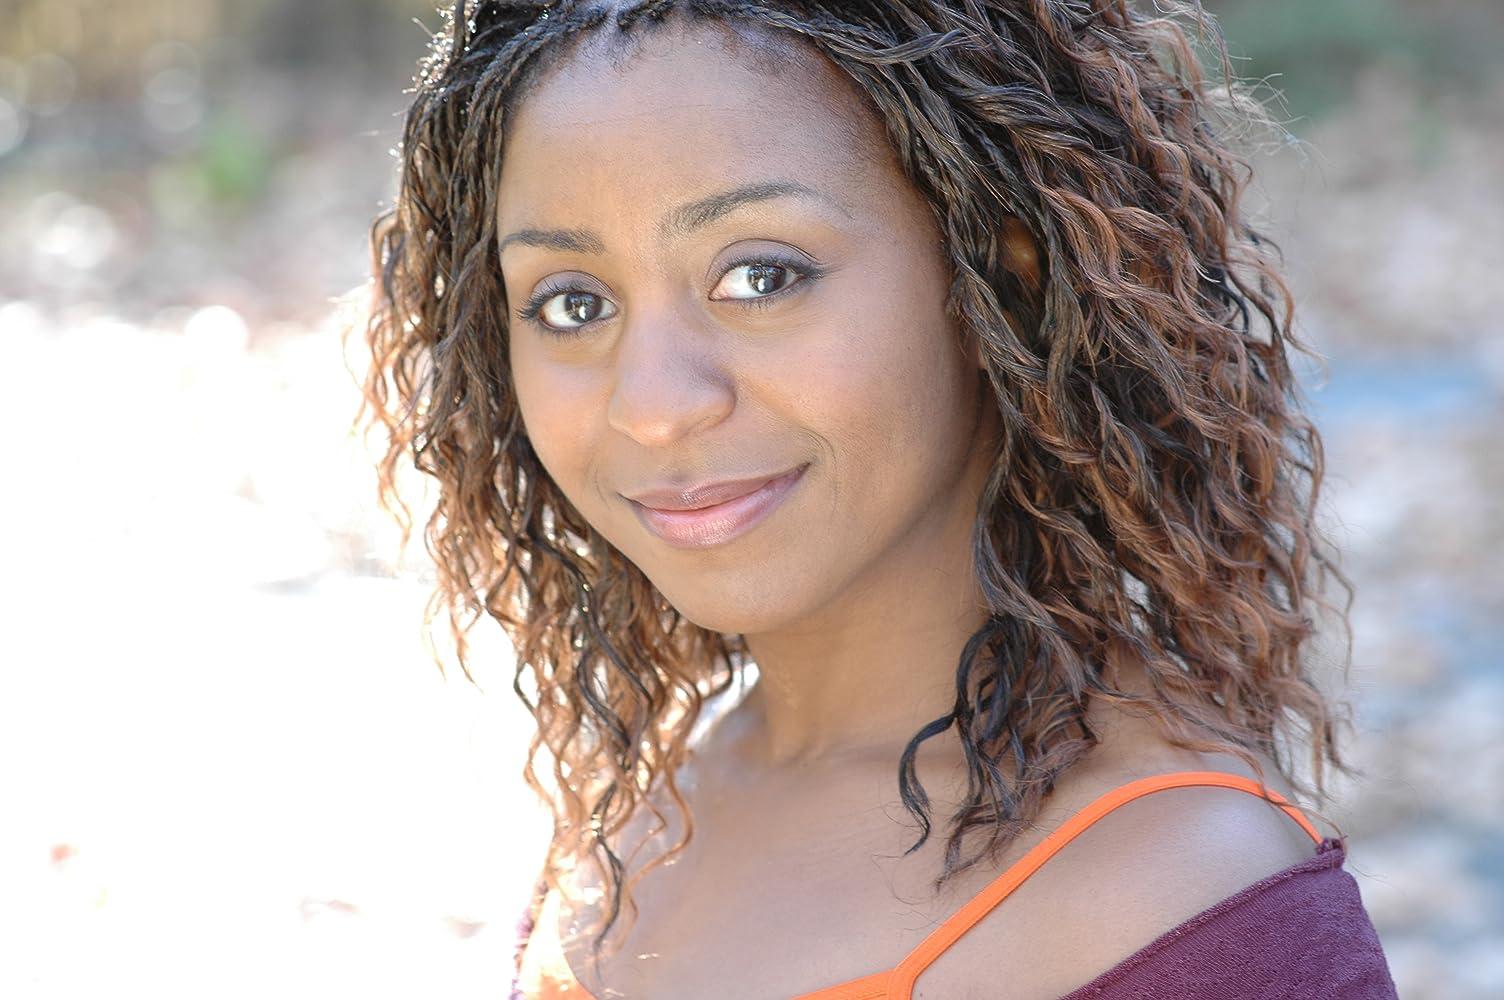 Sophia Thomas